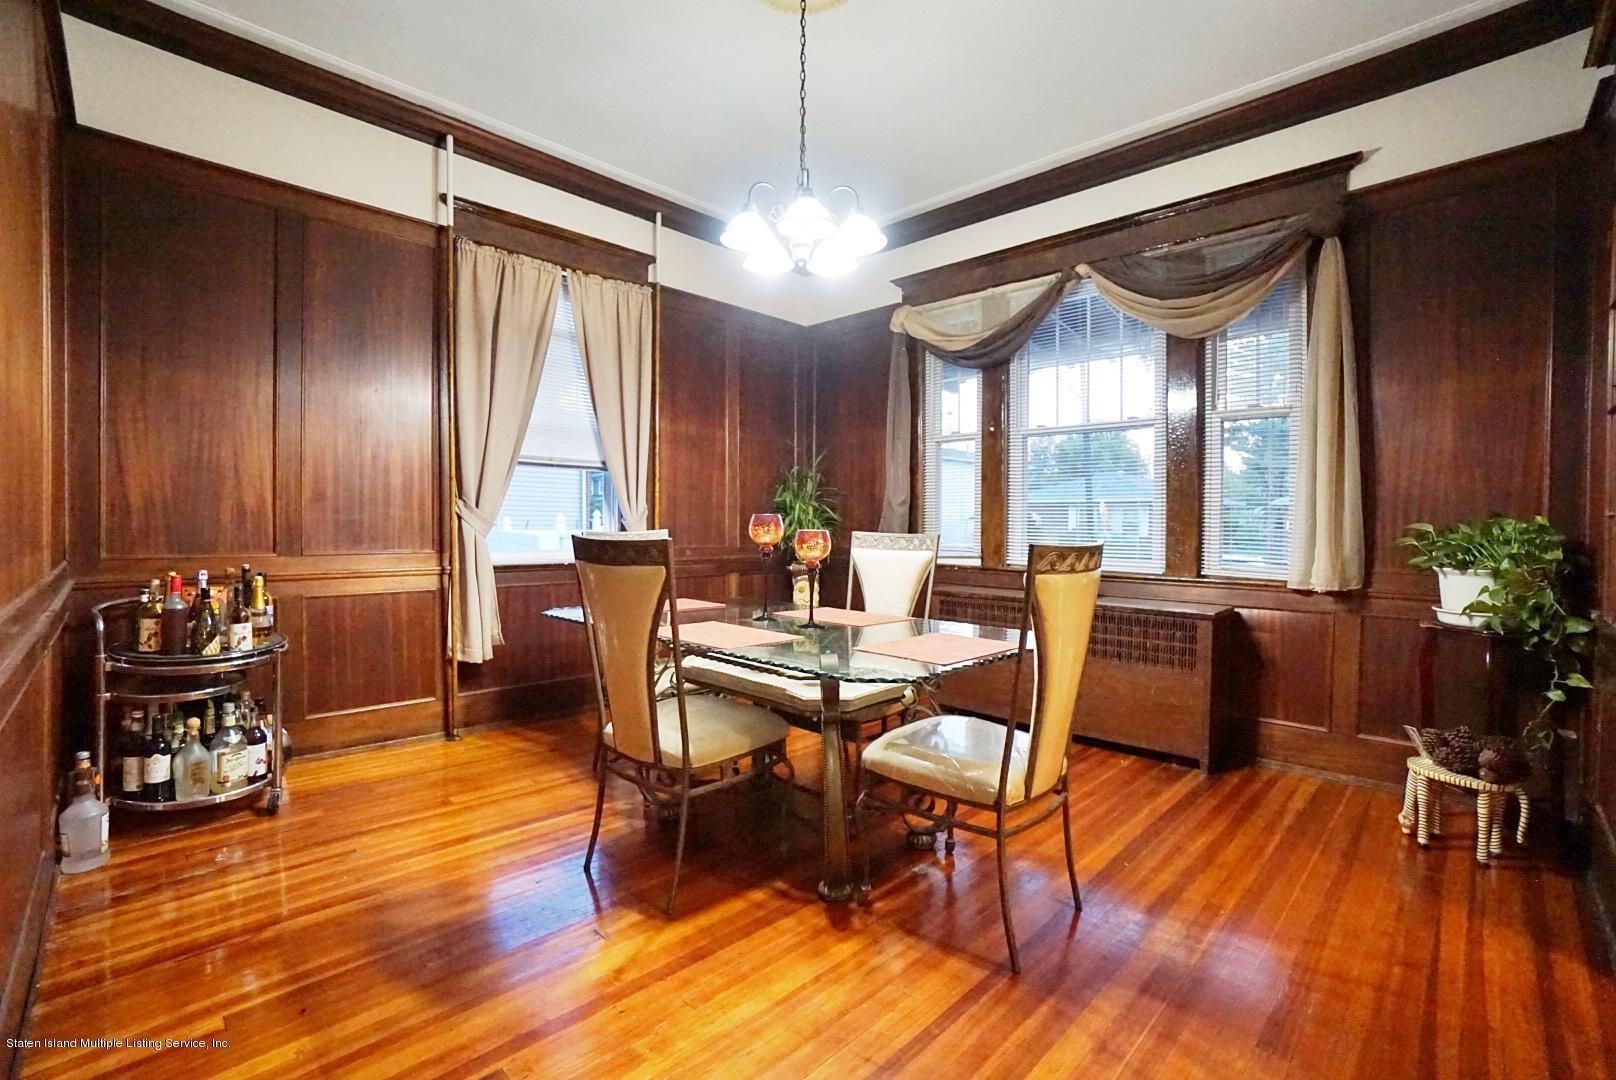 Single Family - Detached 31 Pelton Avenue  Staten Island, NY 10310, MLS-1132177-10